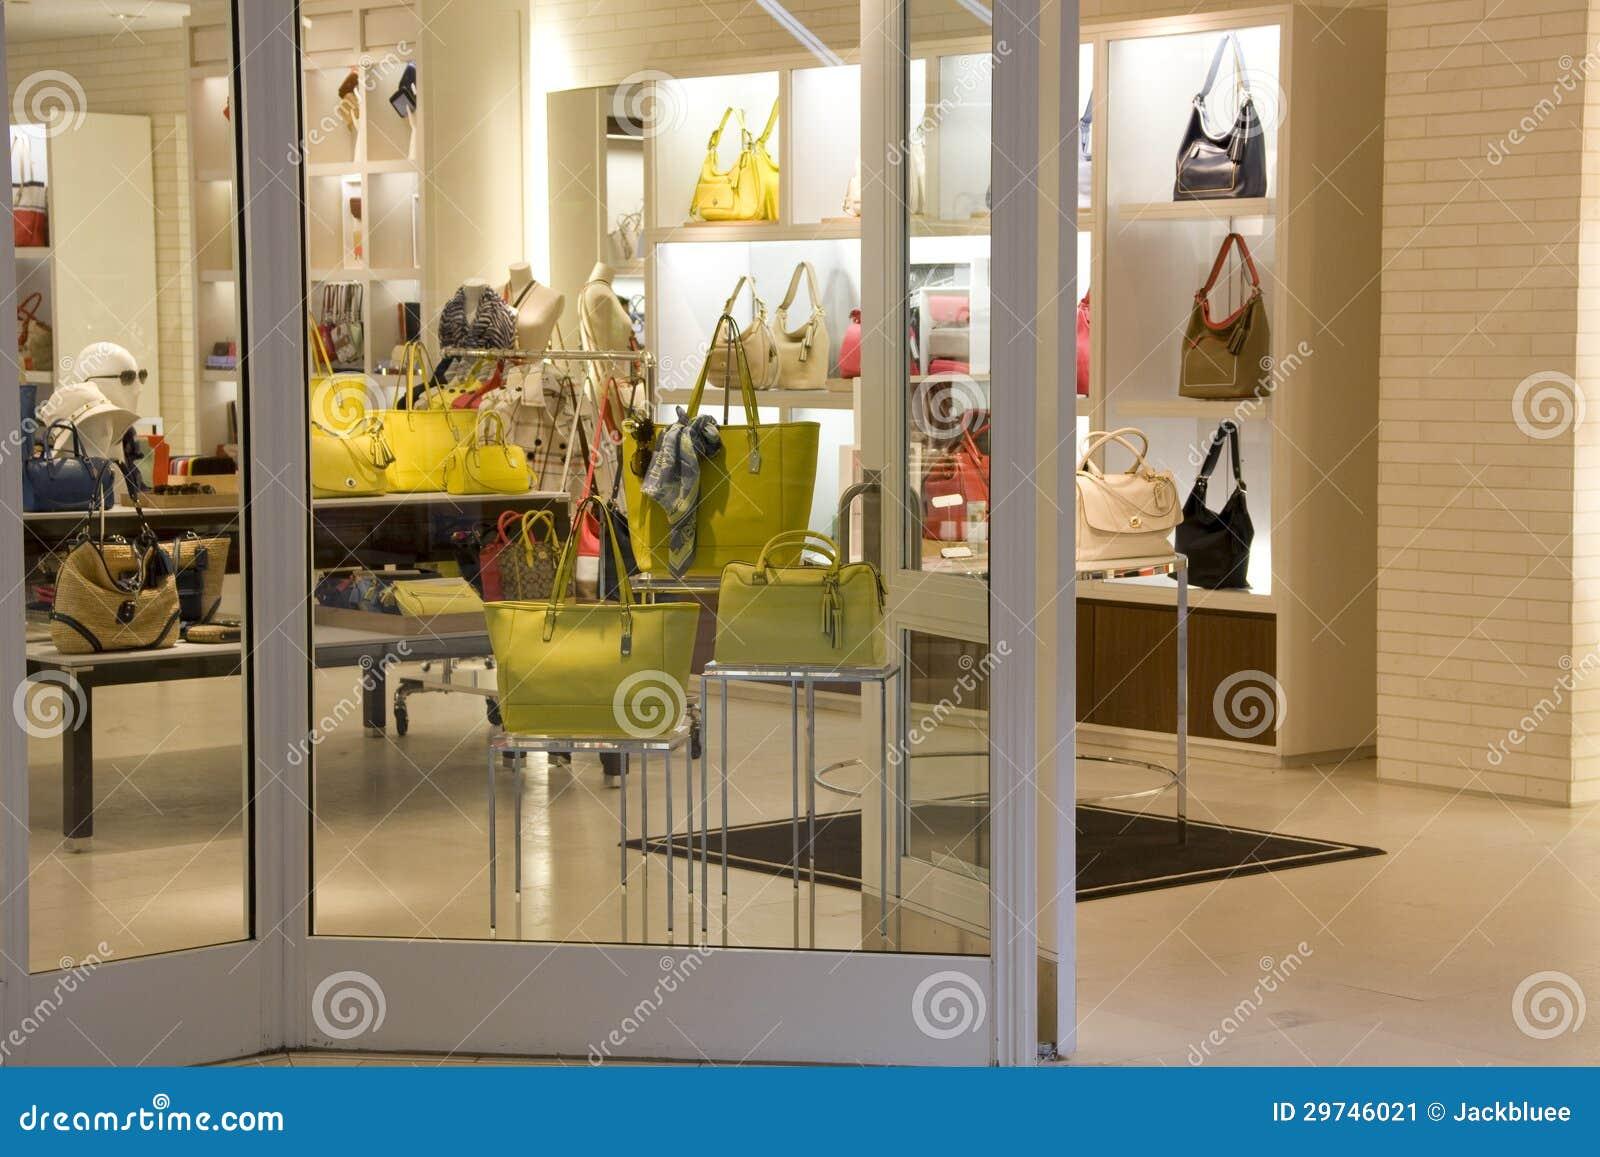 1bcc39a5ea Luxury Handbag Fashion Store Stock Image - Image of interiors ...